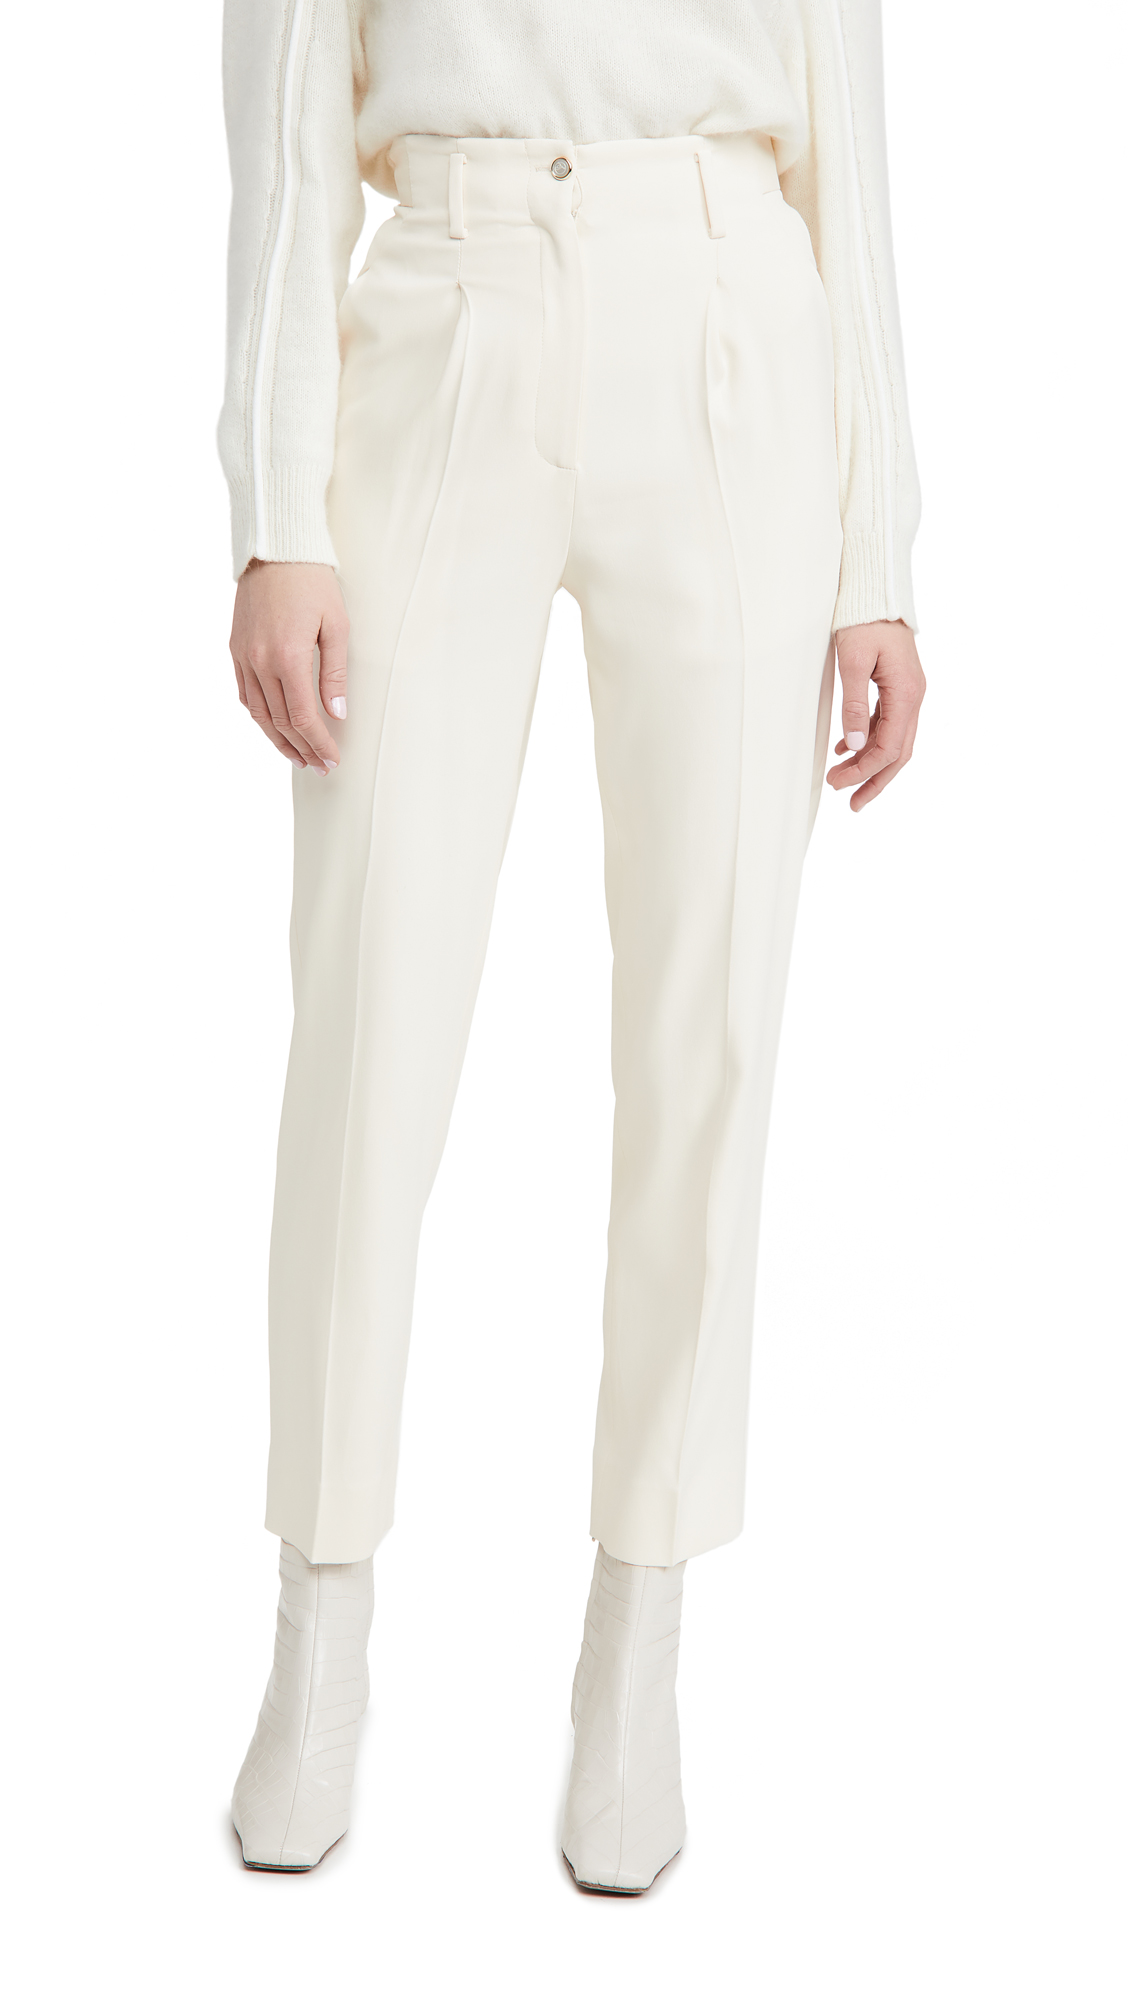 Temperley London Marlene Tailored Trousers